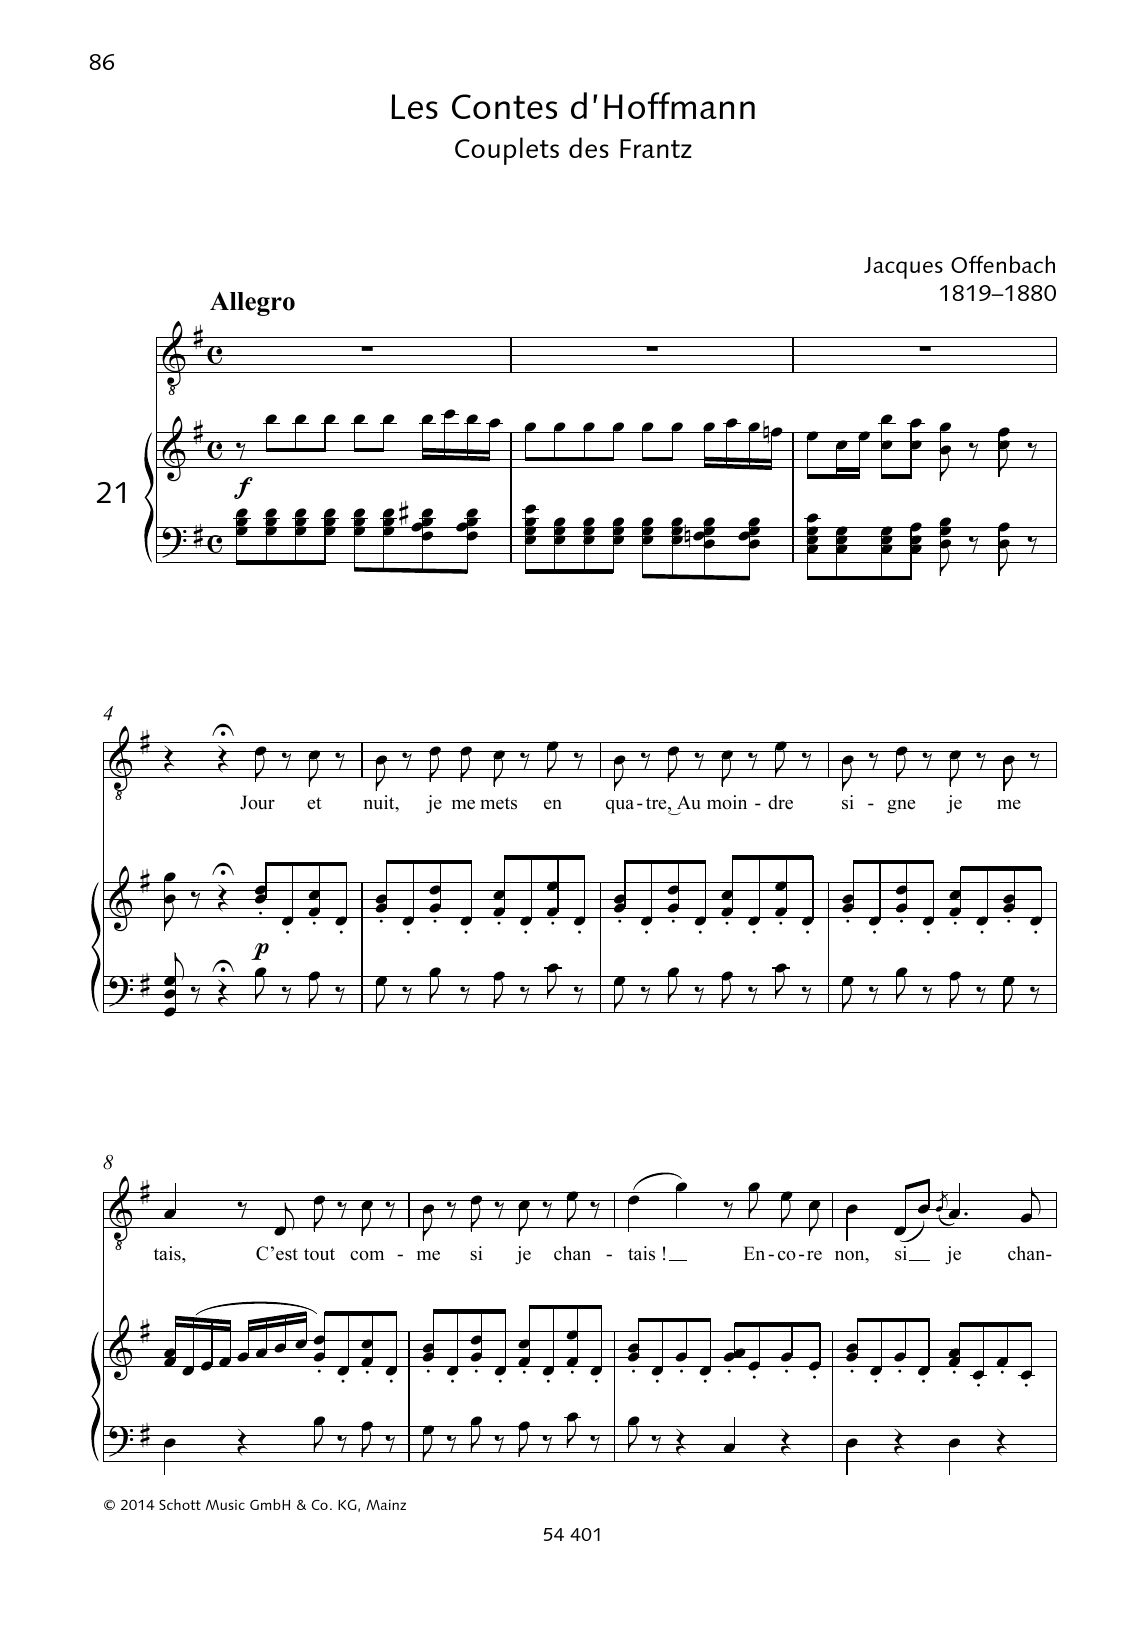 Jour et nuit Sheet Music